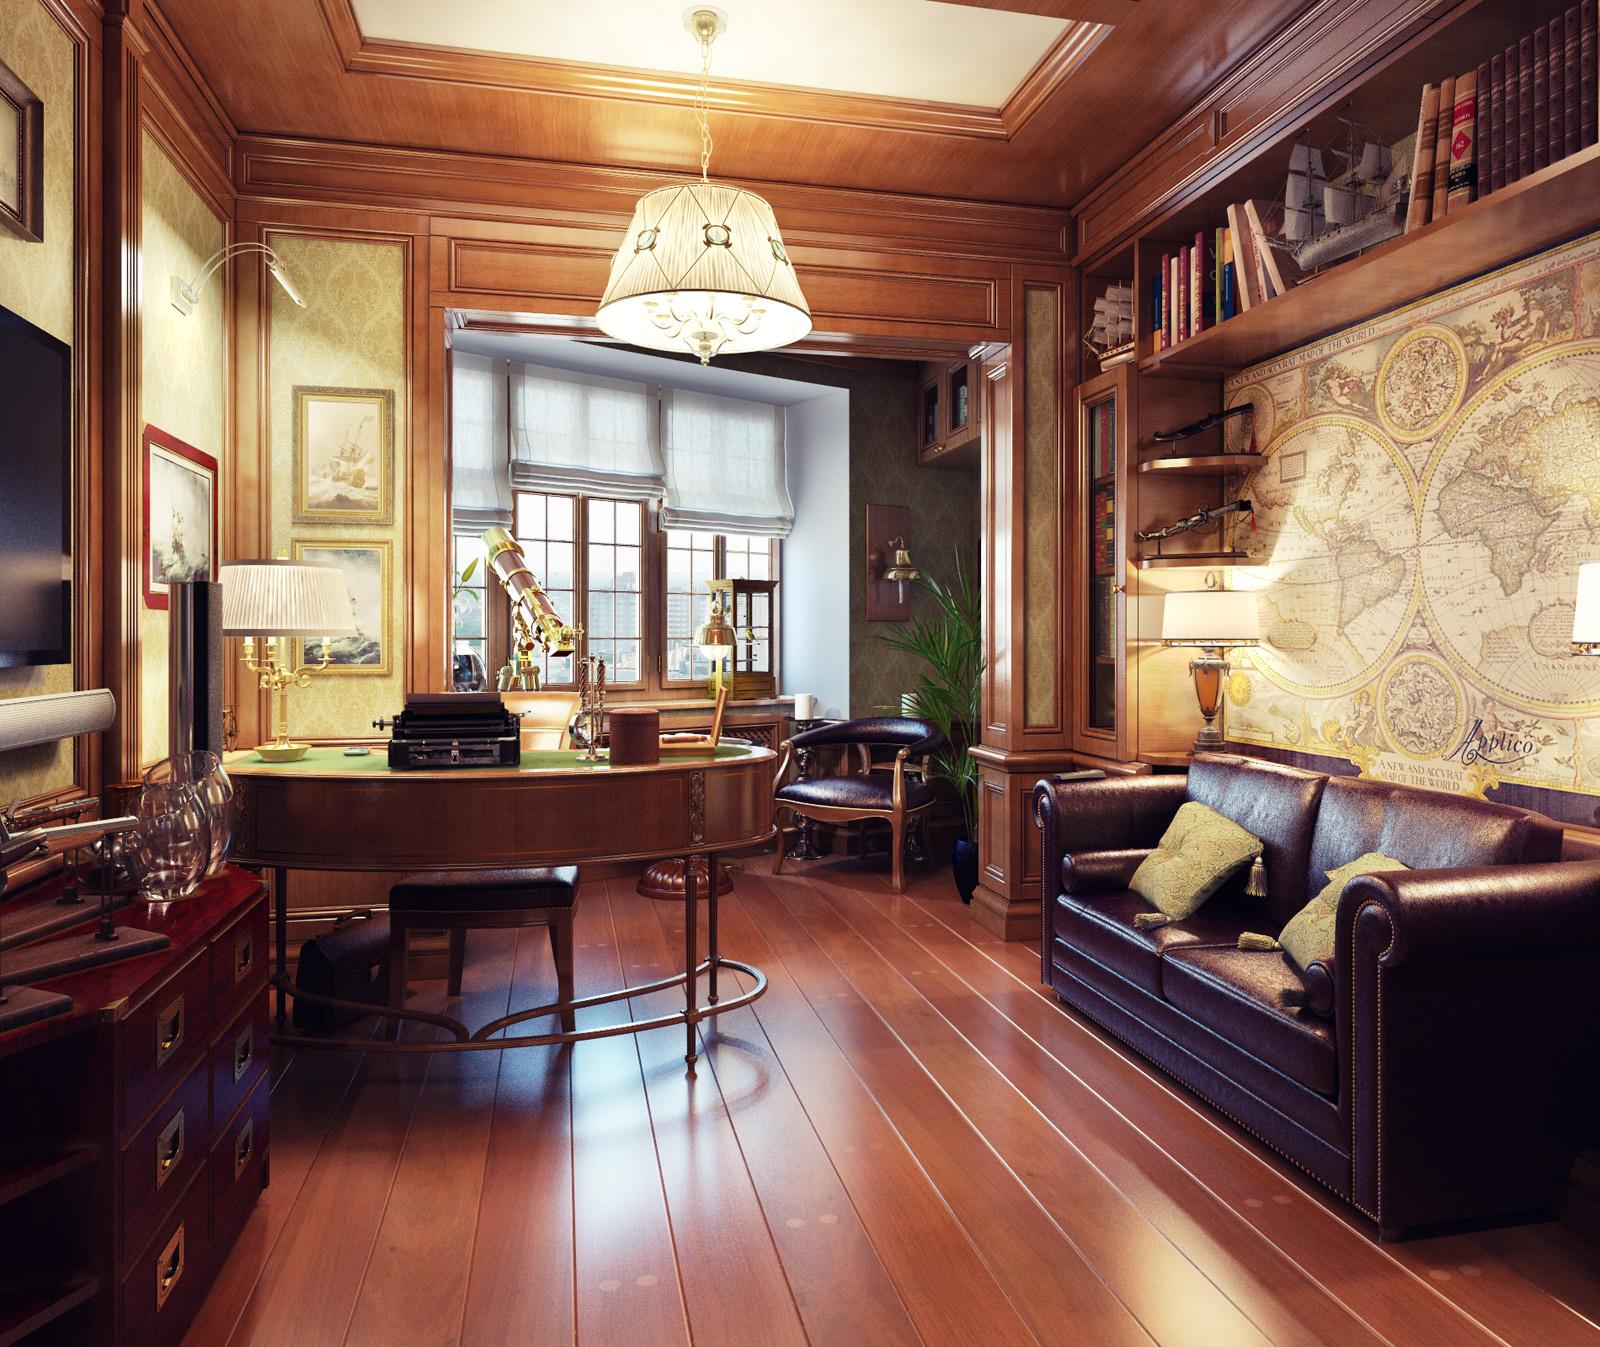 Study Room With Aquarium: Royal Home Designs !